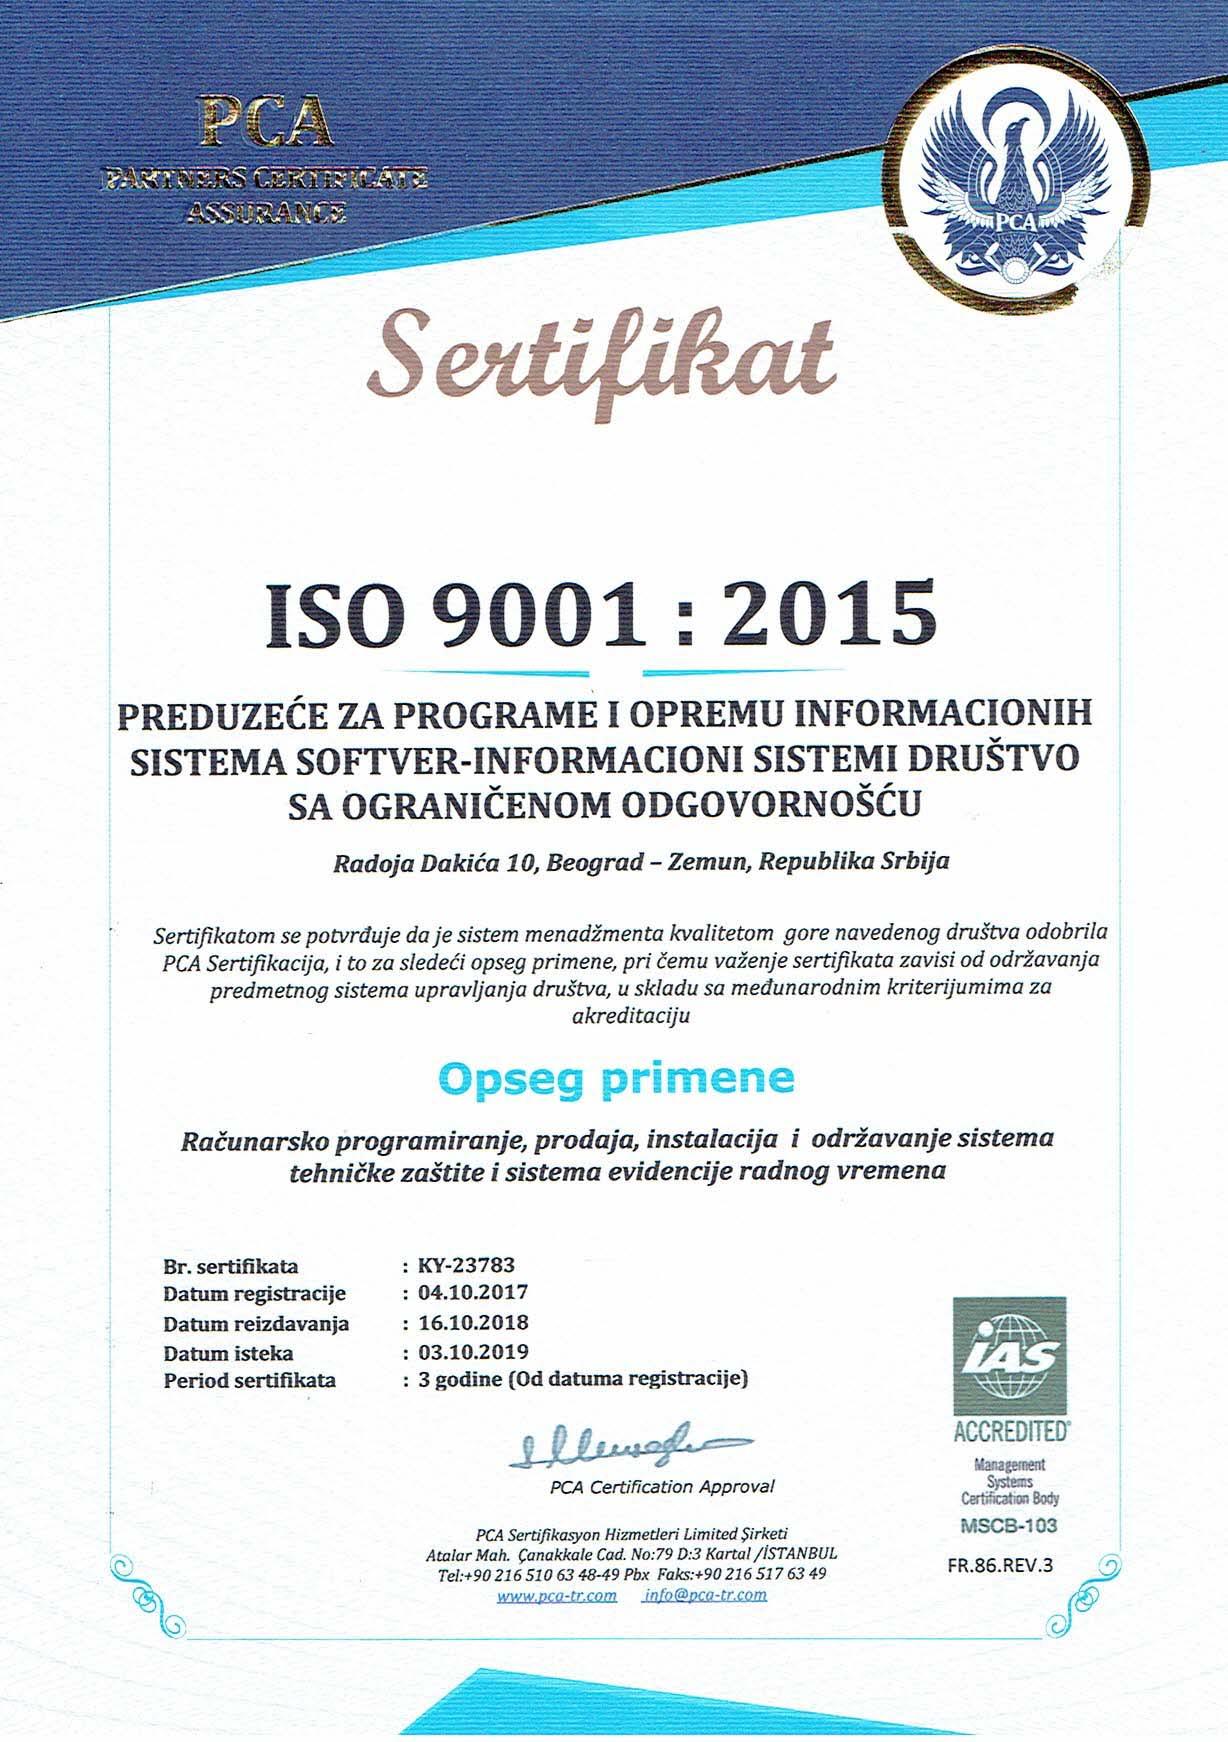 sertifikat-srpski